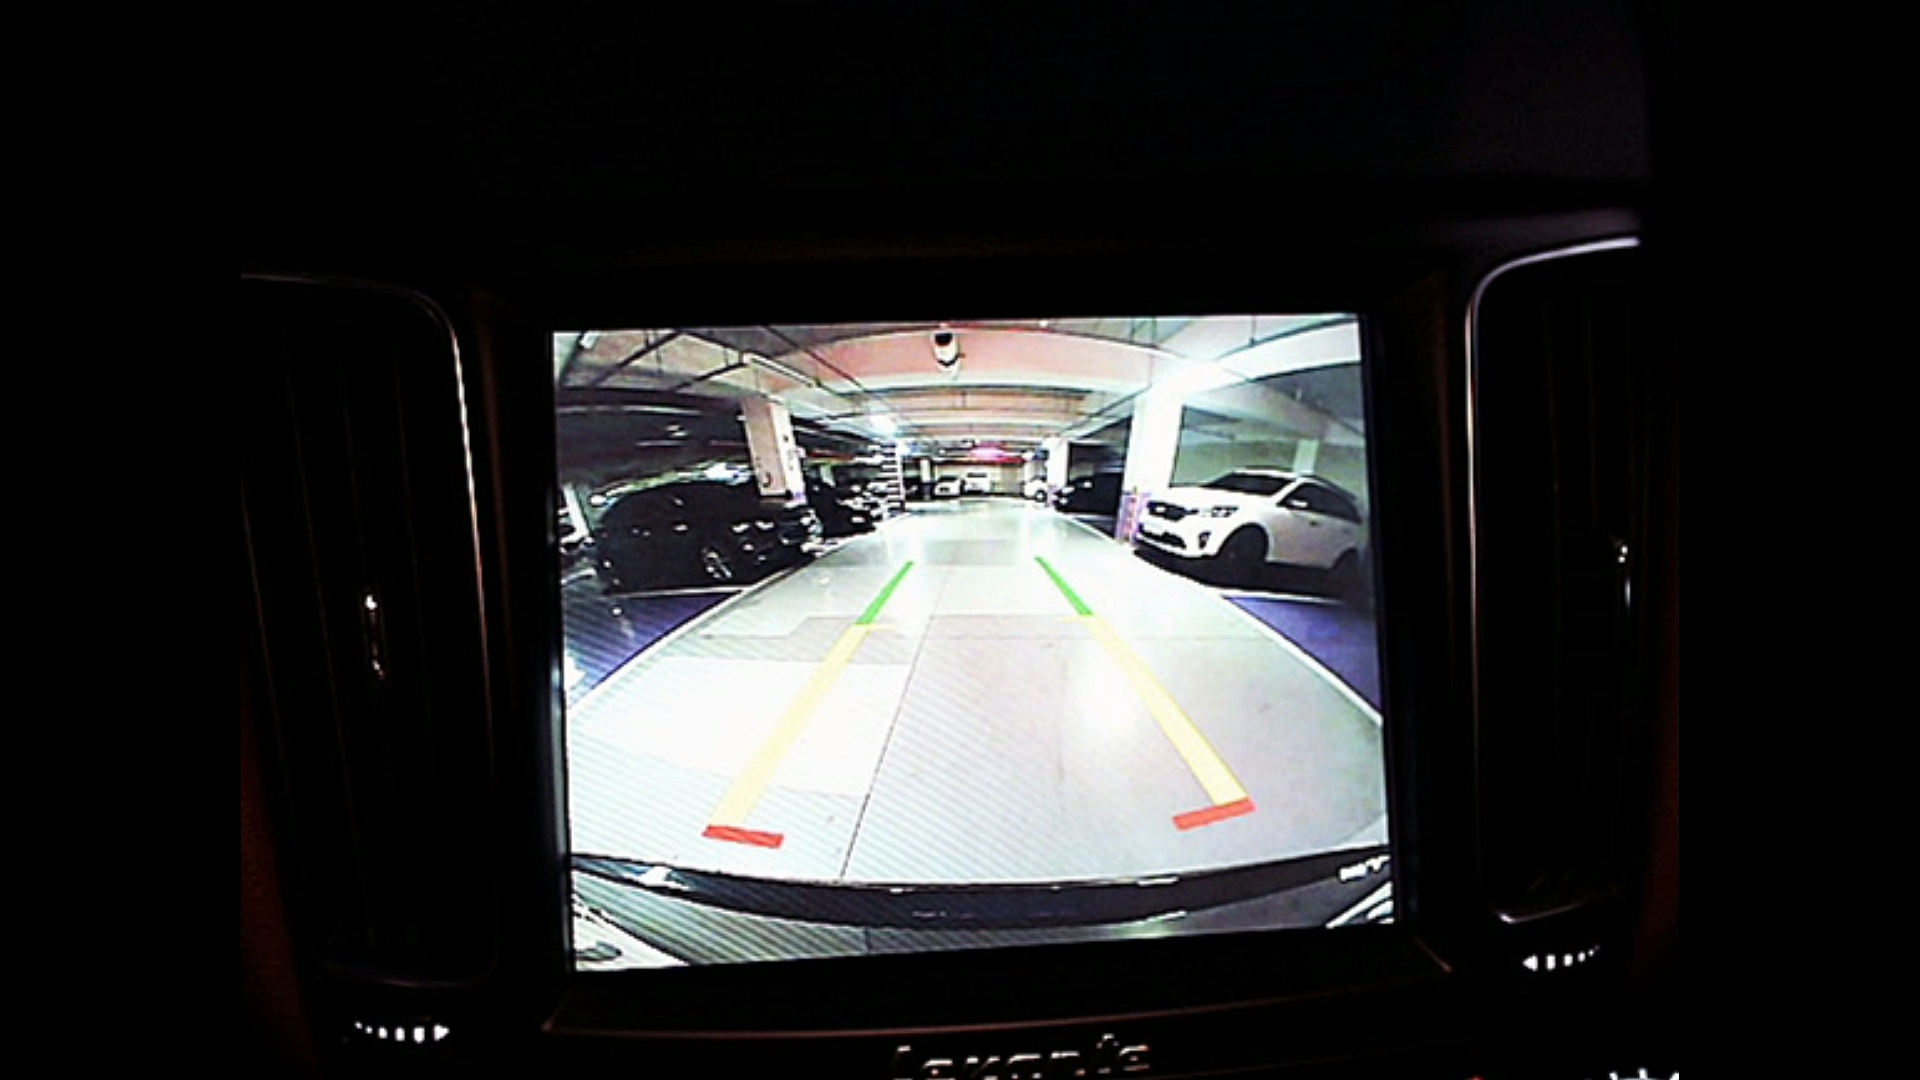 Maserati Leante 3.0 diesel cars video SUV cars video SUV car कारों वीडियो ऑफ-रोड वाहन डब्बा